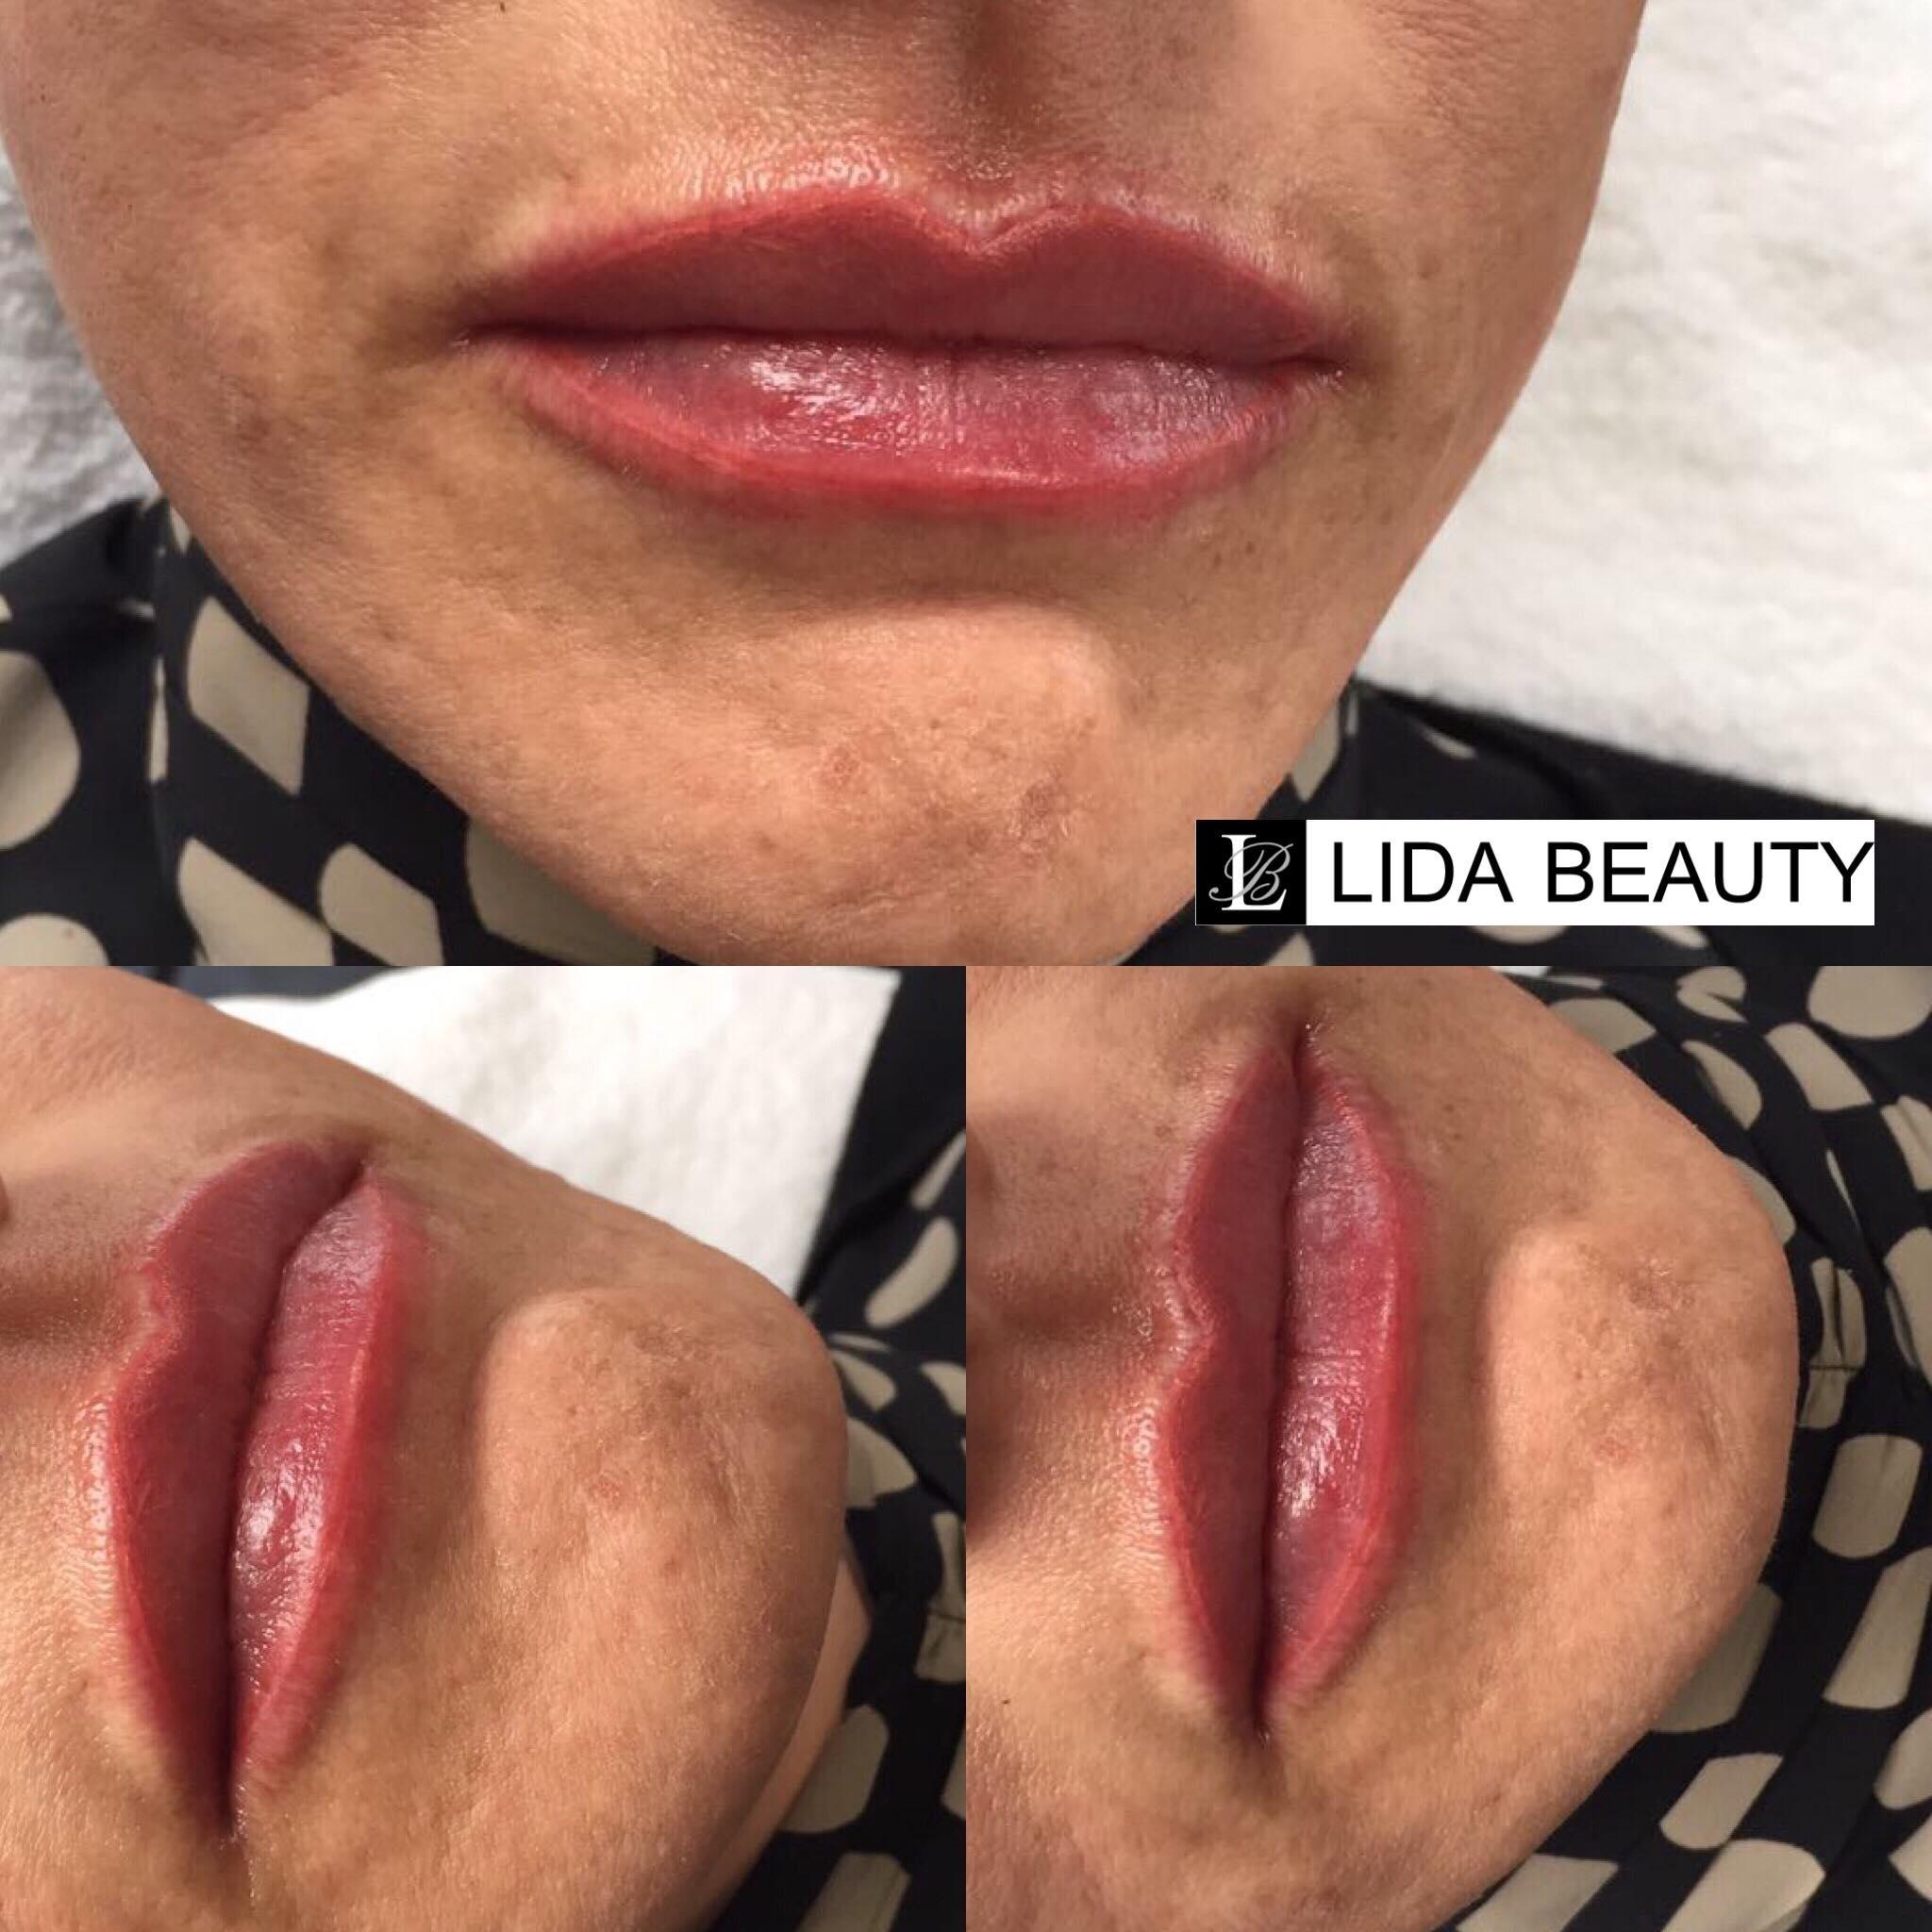 Lippen Vollschattierung